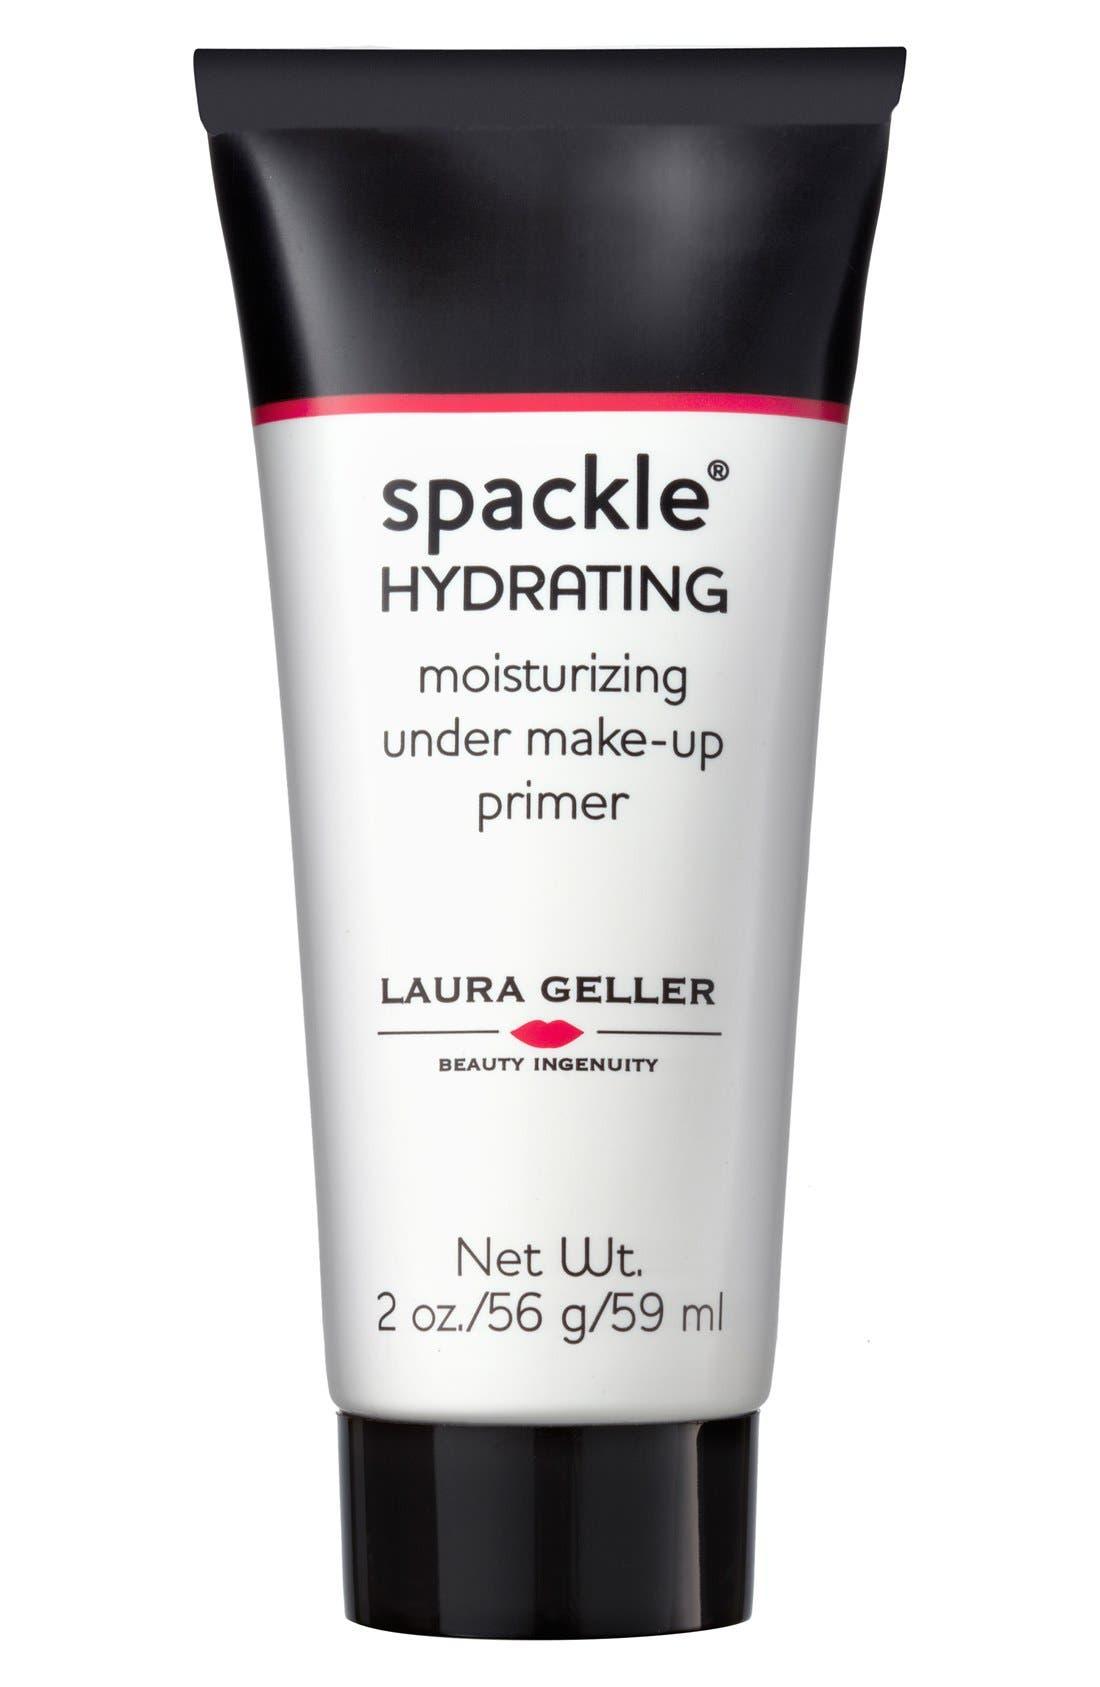 Laura Geller Beauty 'Spackle®' Hydrating Under Makeup Primer